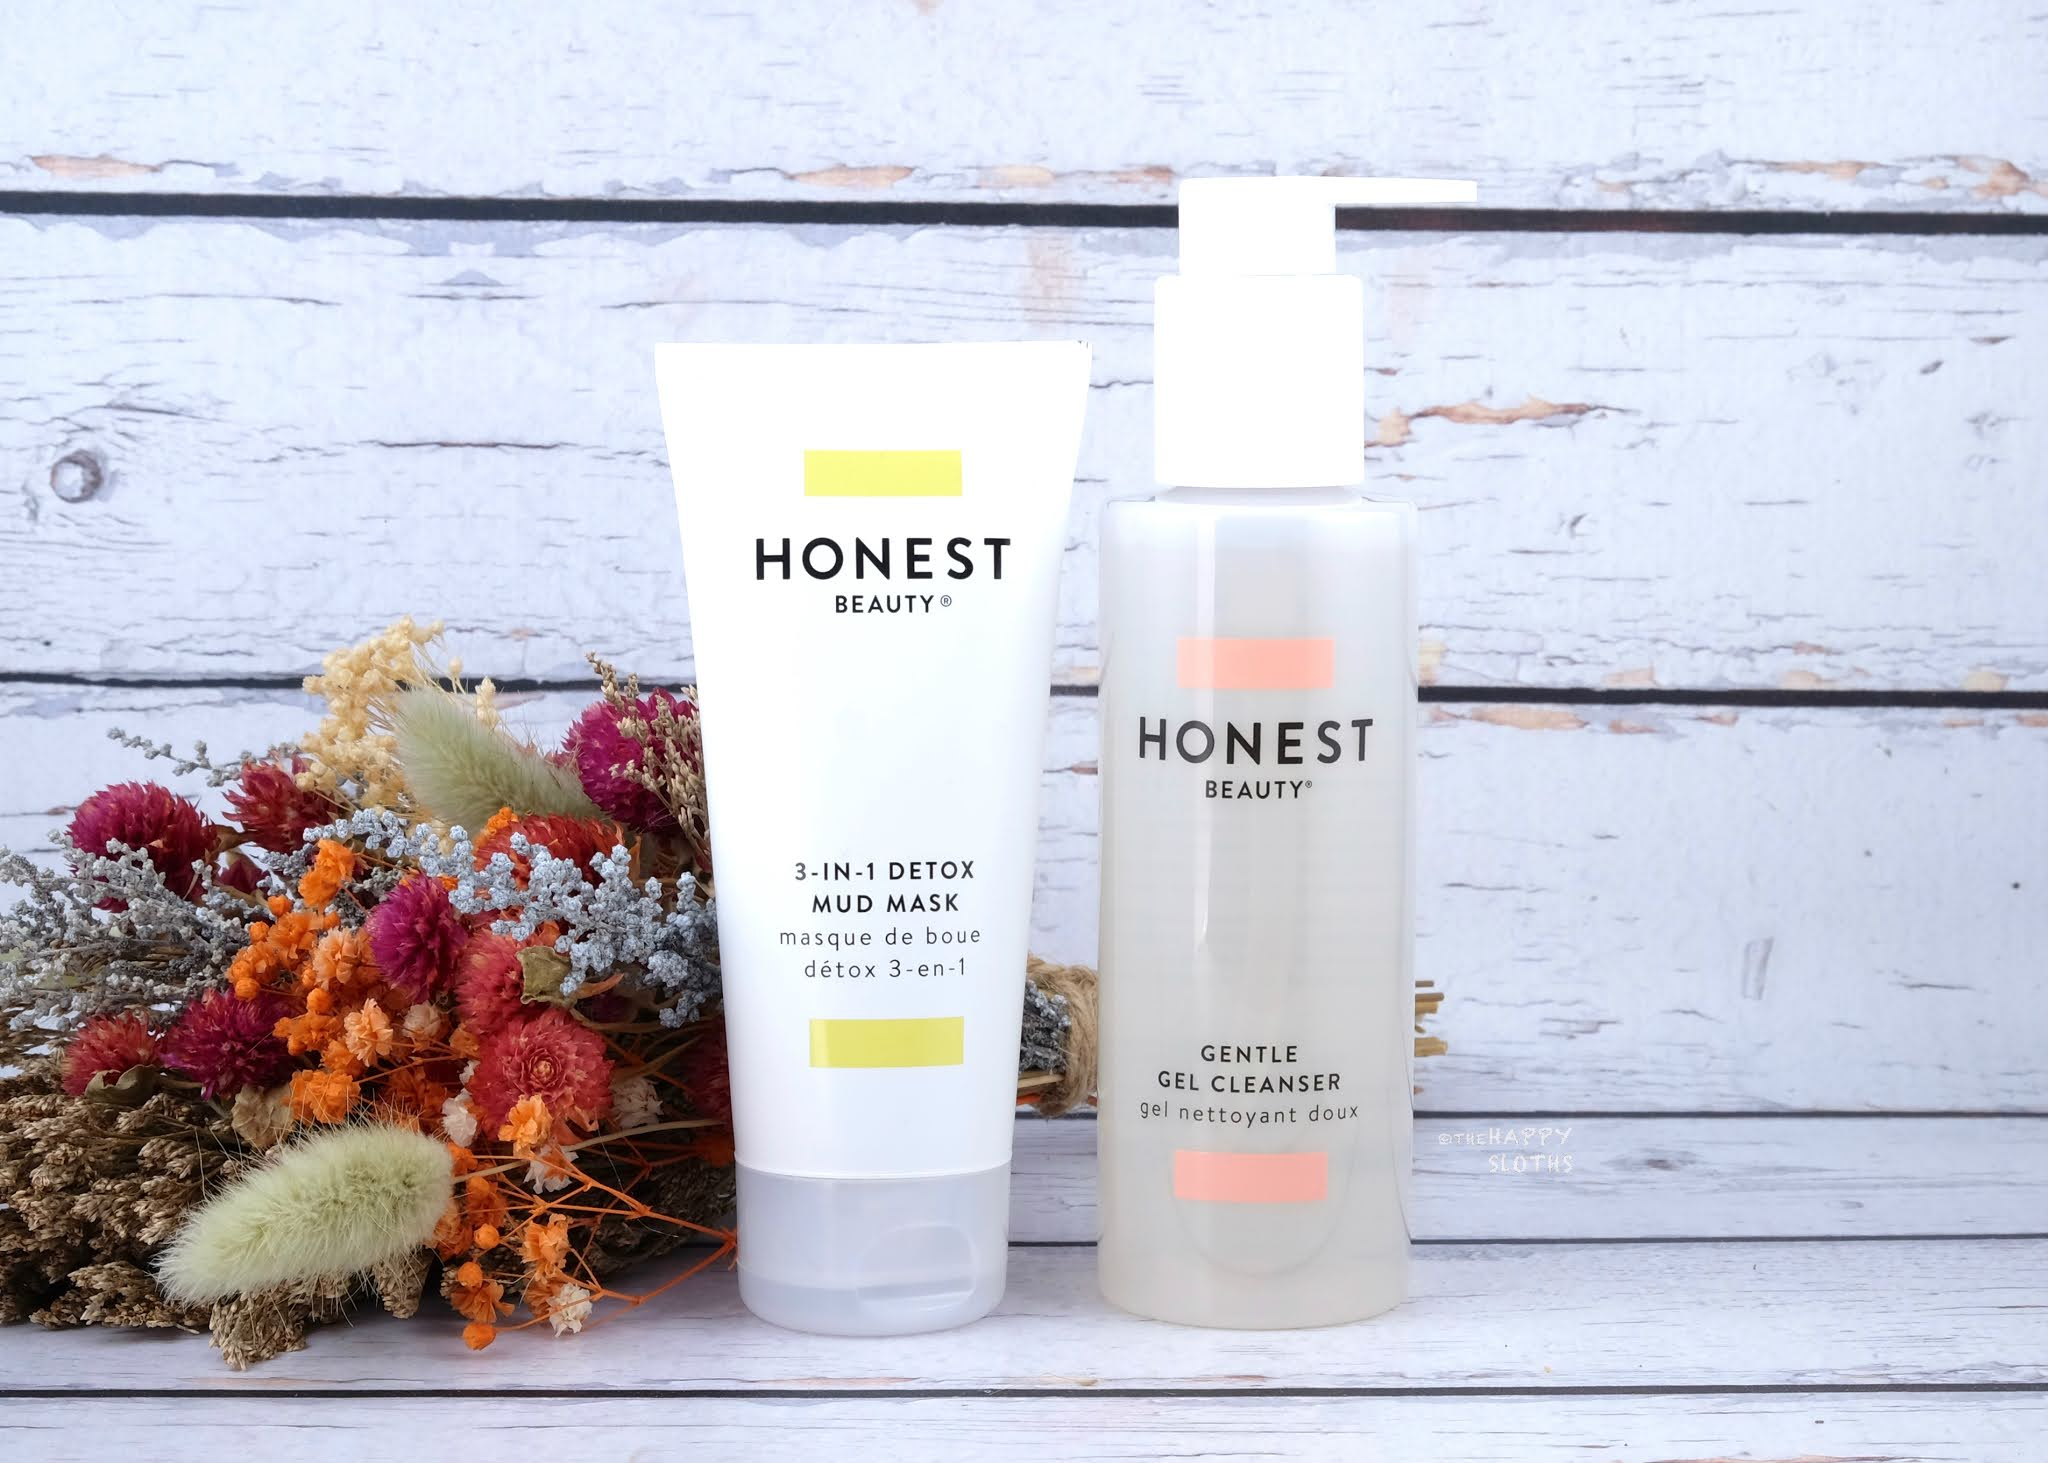 Honest Beauty | Gentle Gel Cleanser & 3-in-1 Detox Mud Mask: Review